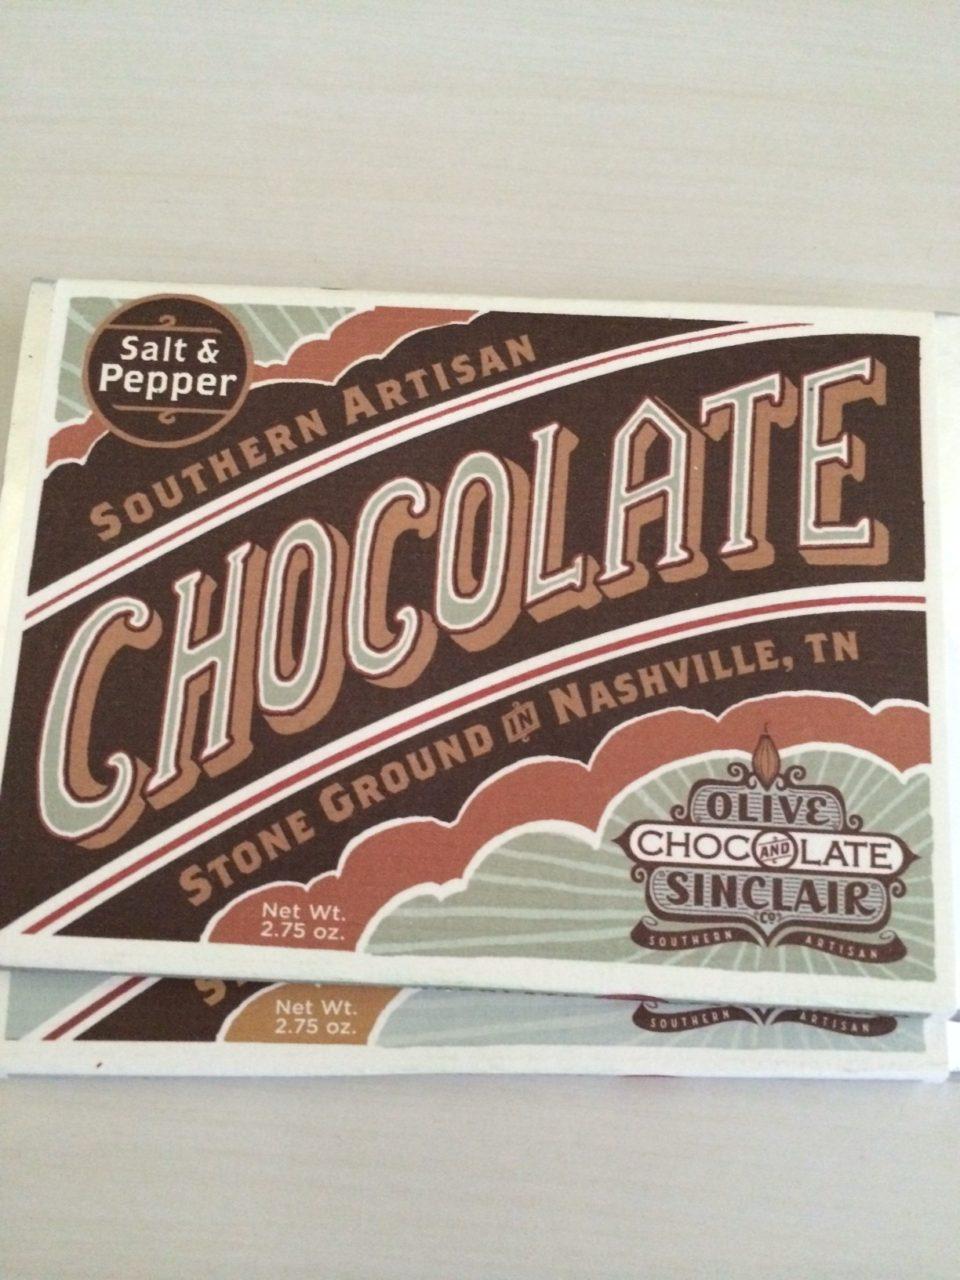 Nashville made chocolate